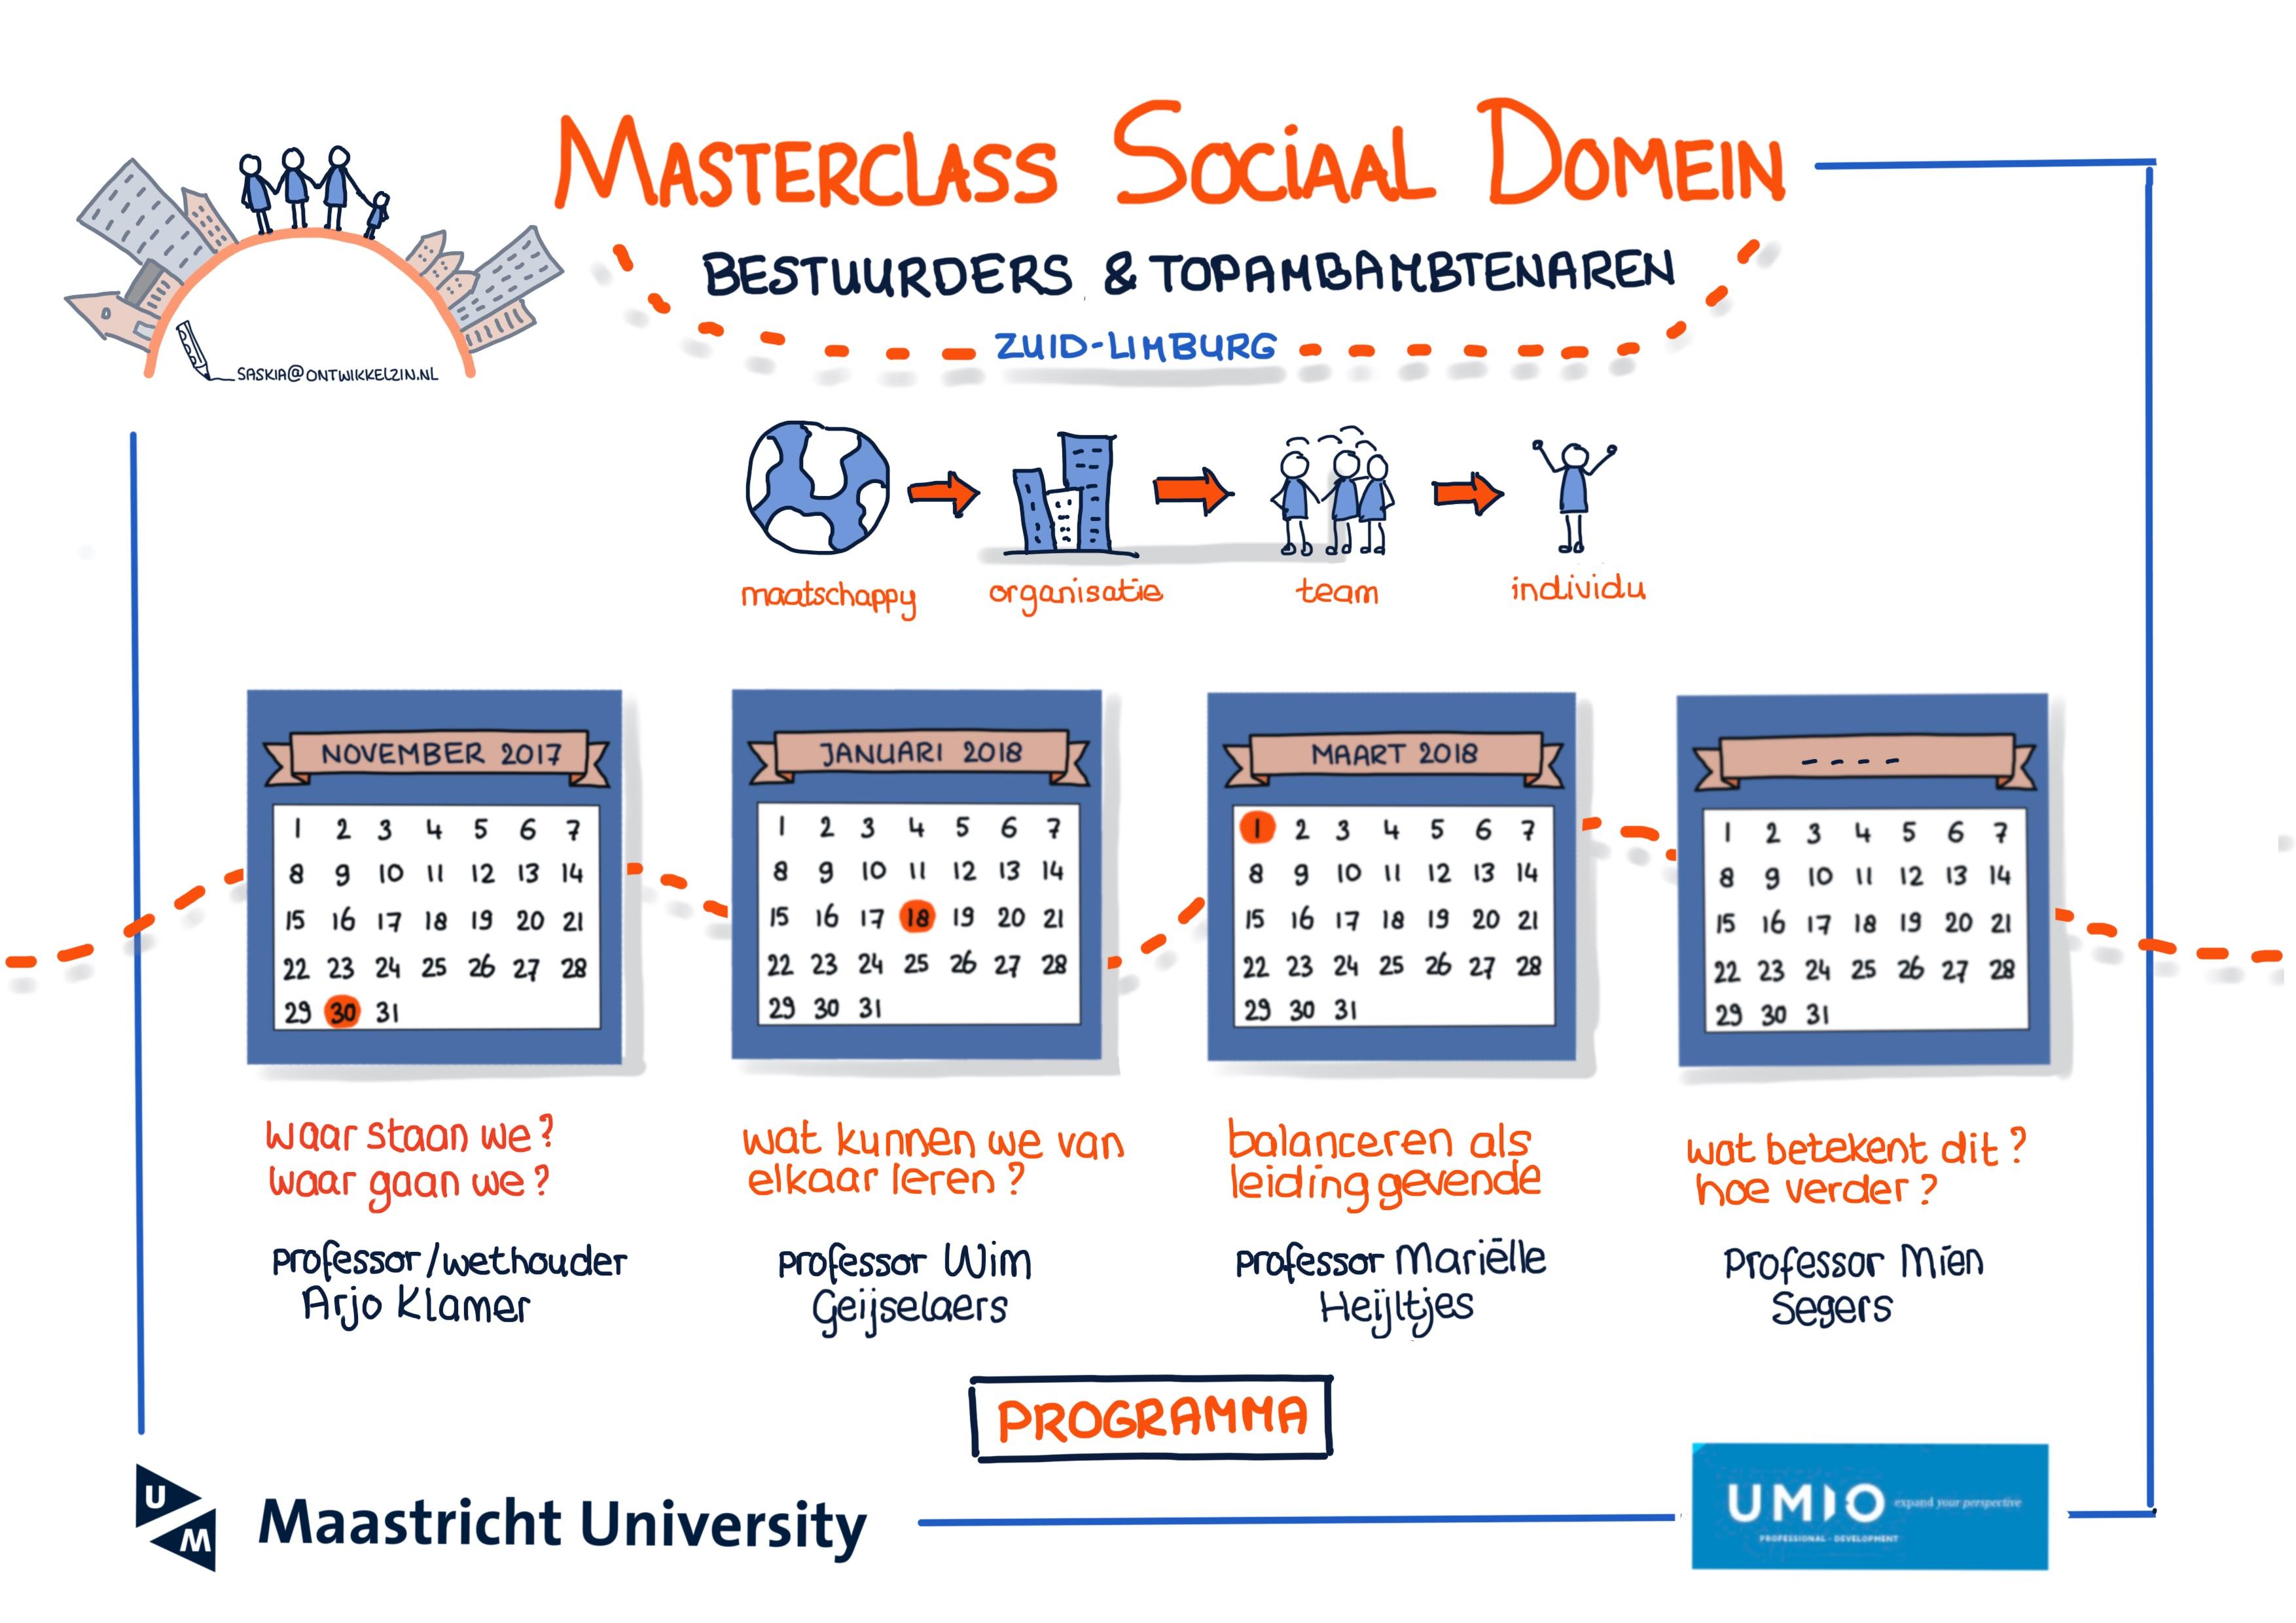 Programma van de Masterclass Sociaal Domein